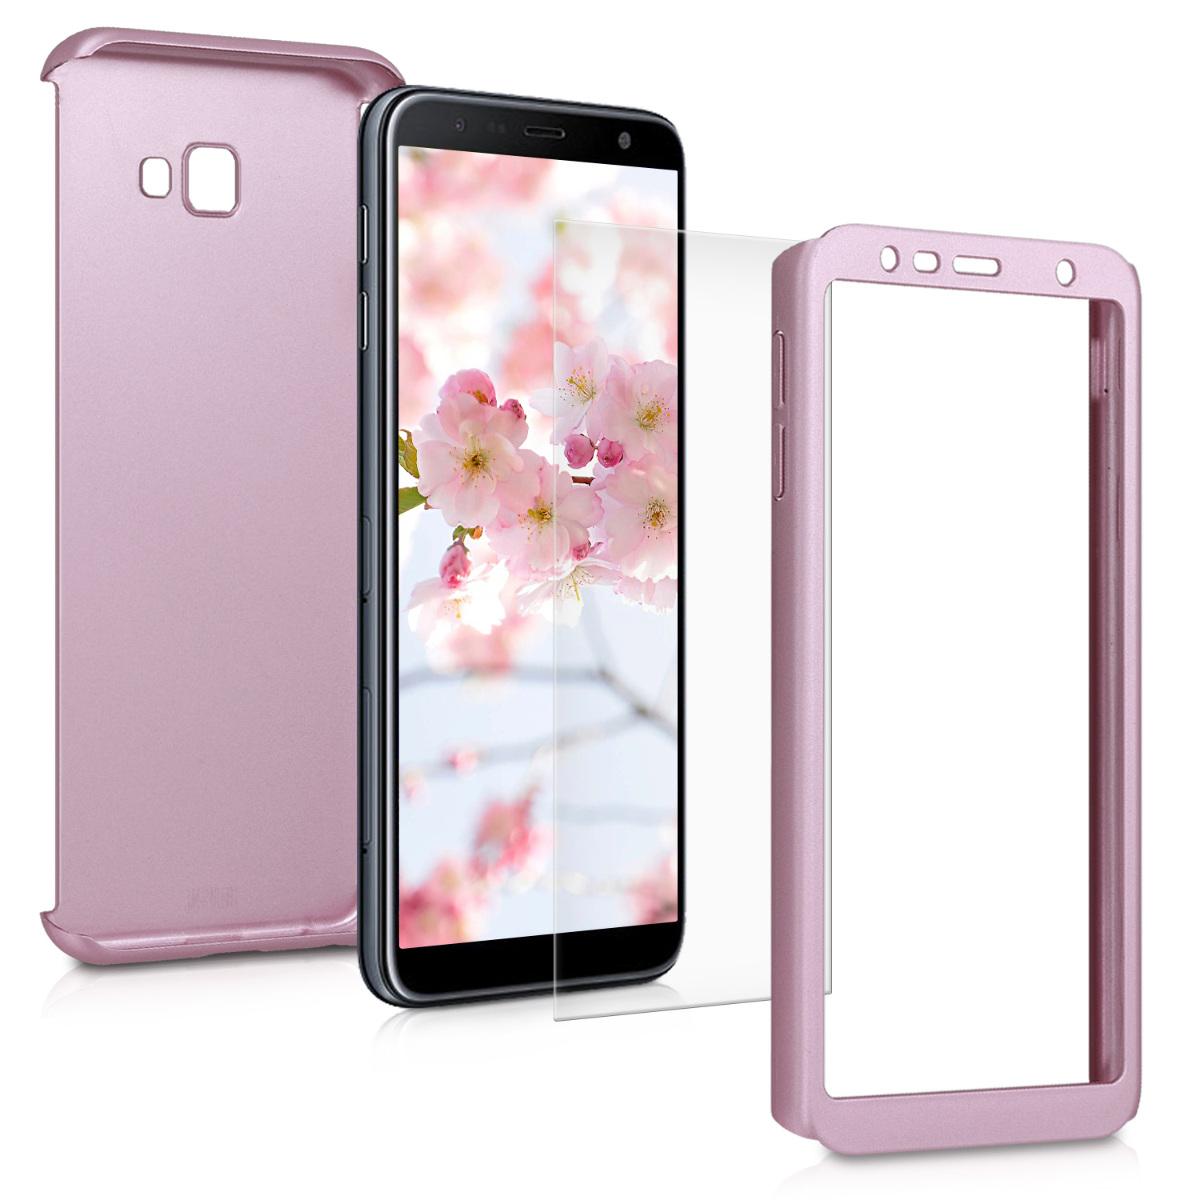 KW Θήκη Full Body Samsung Galaxy J4 Plus 2018 & Screen Protector - Metallic Rose Gold (47115.31)